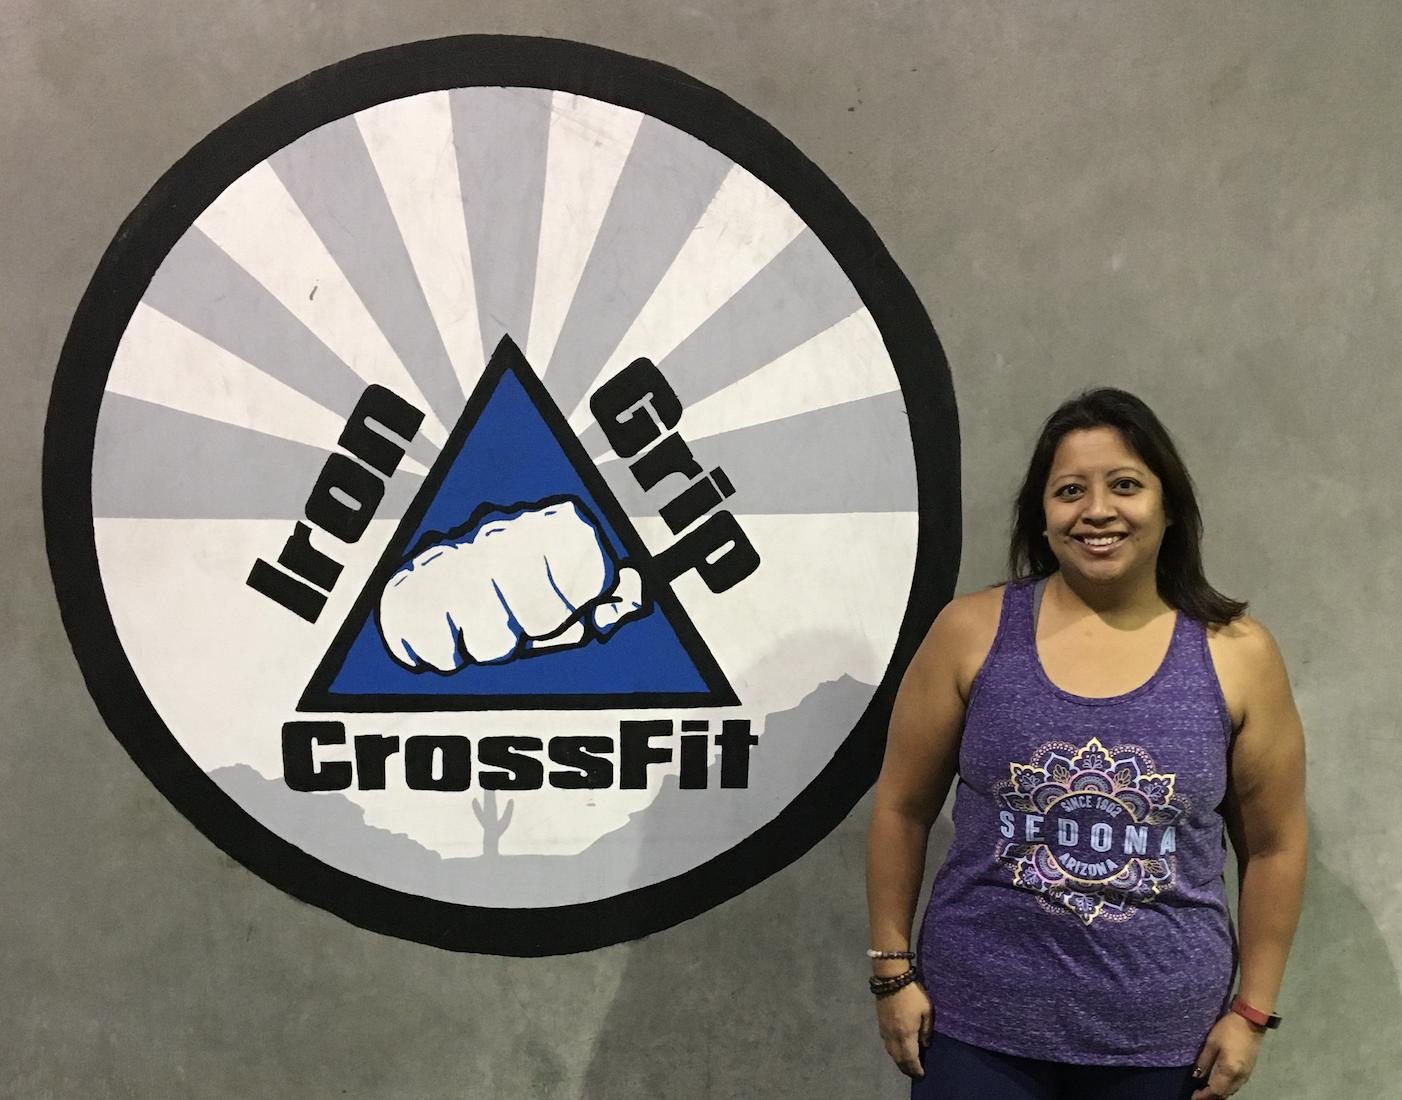 Rose Espinozas success story